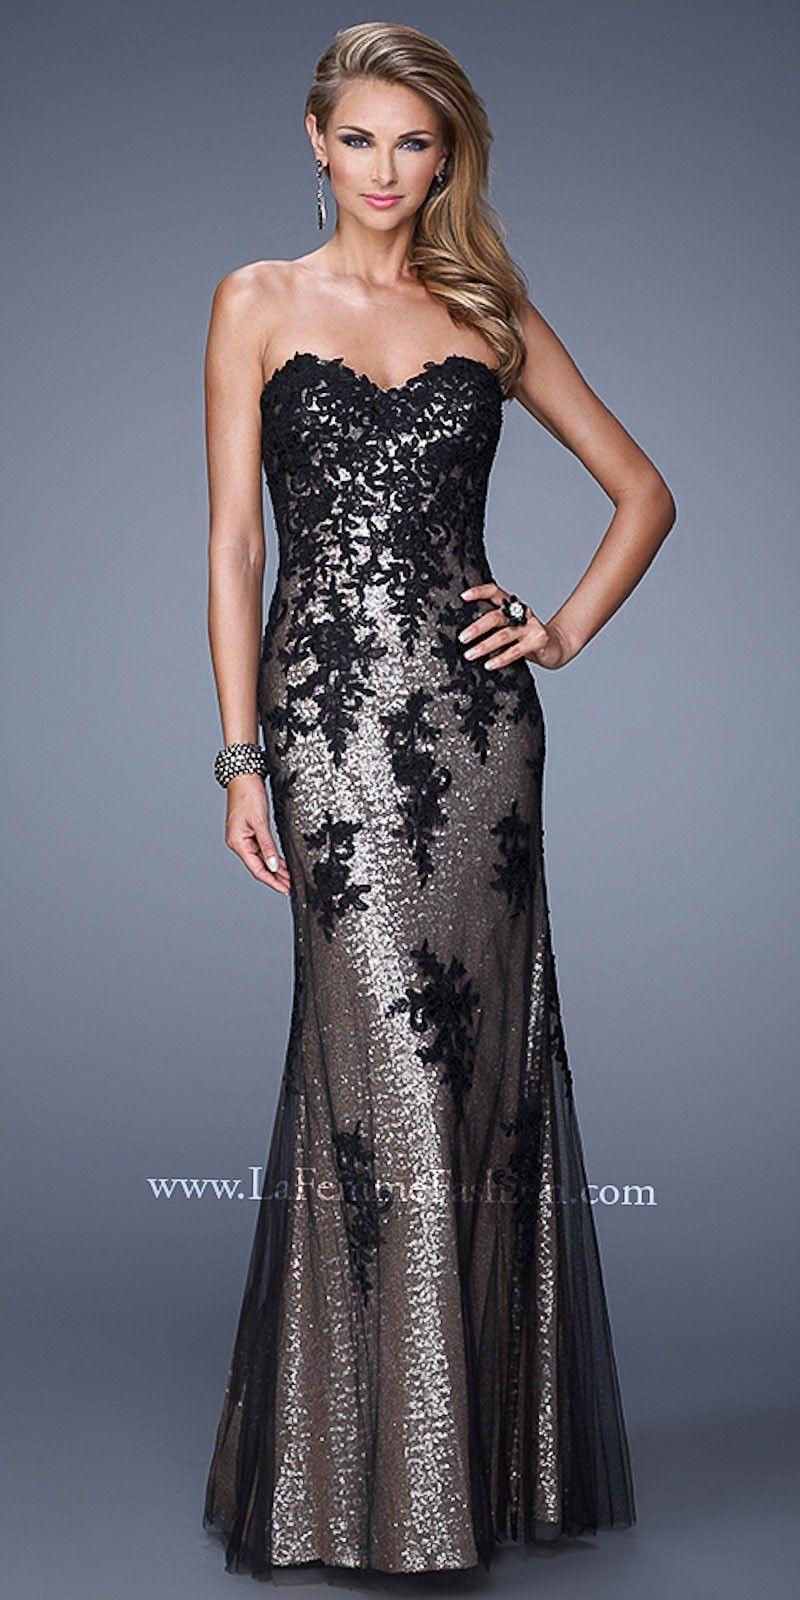 Sequined floral applique prom dresses by la femme clothes of